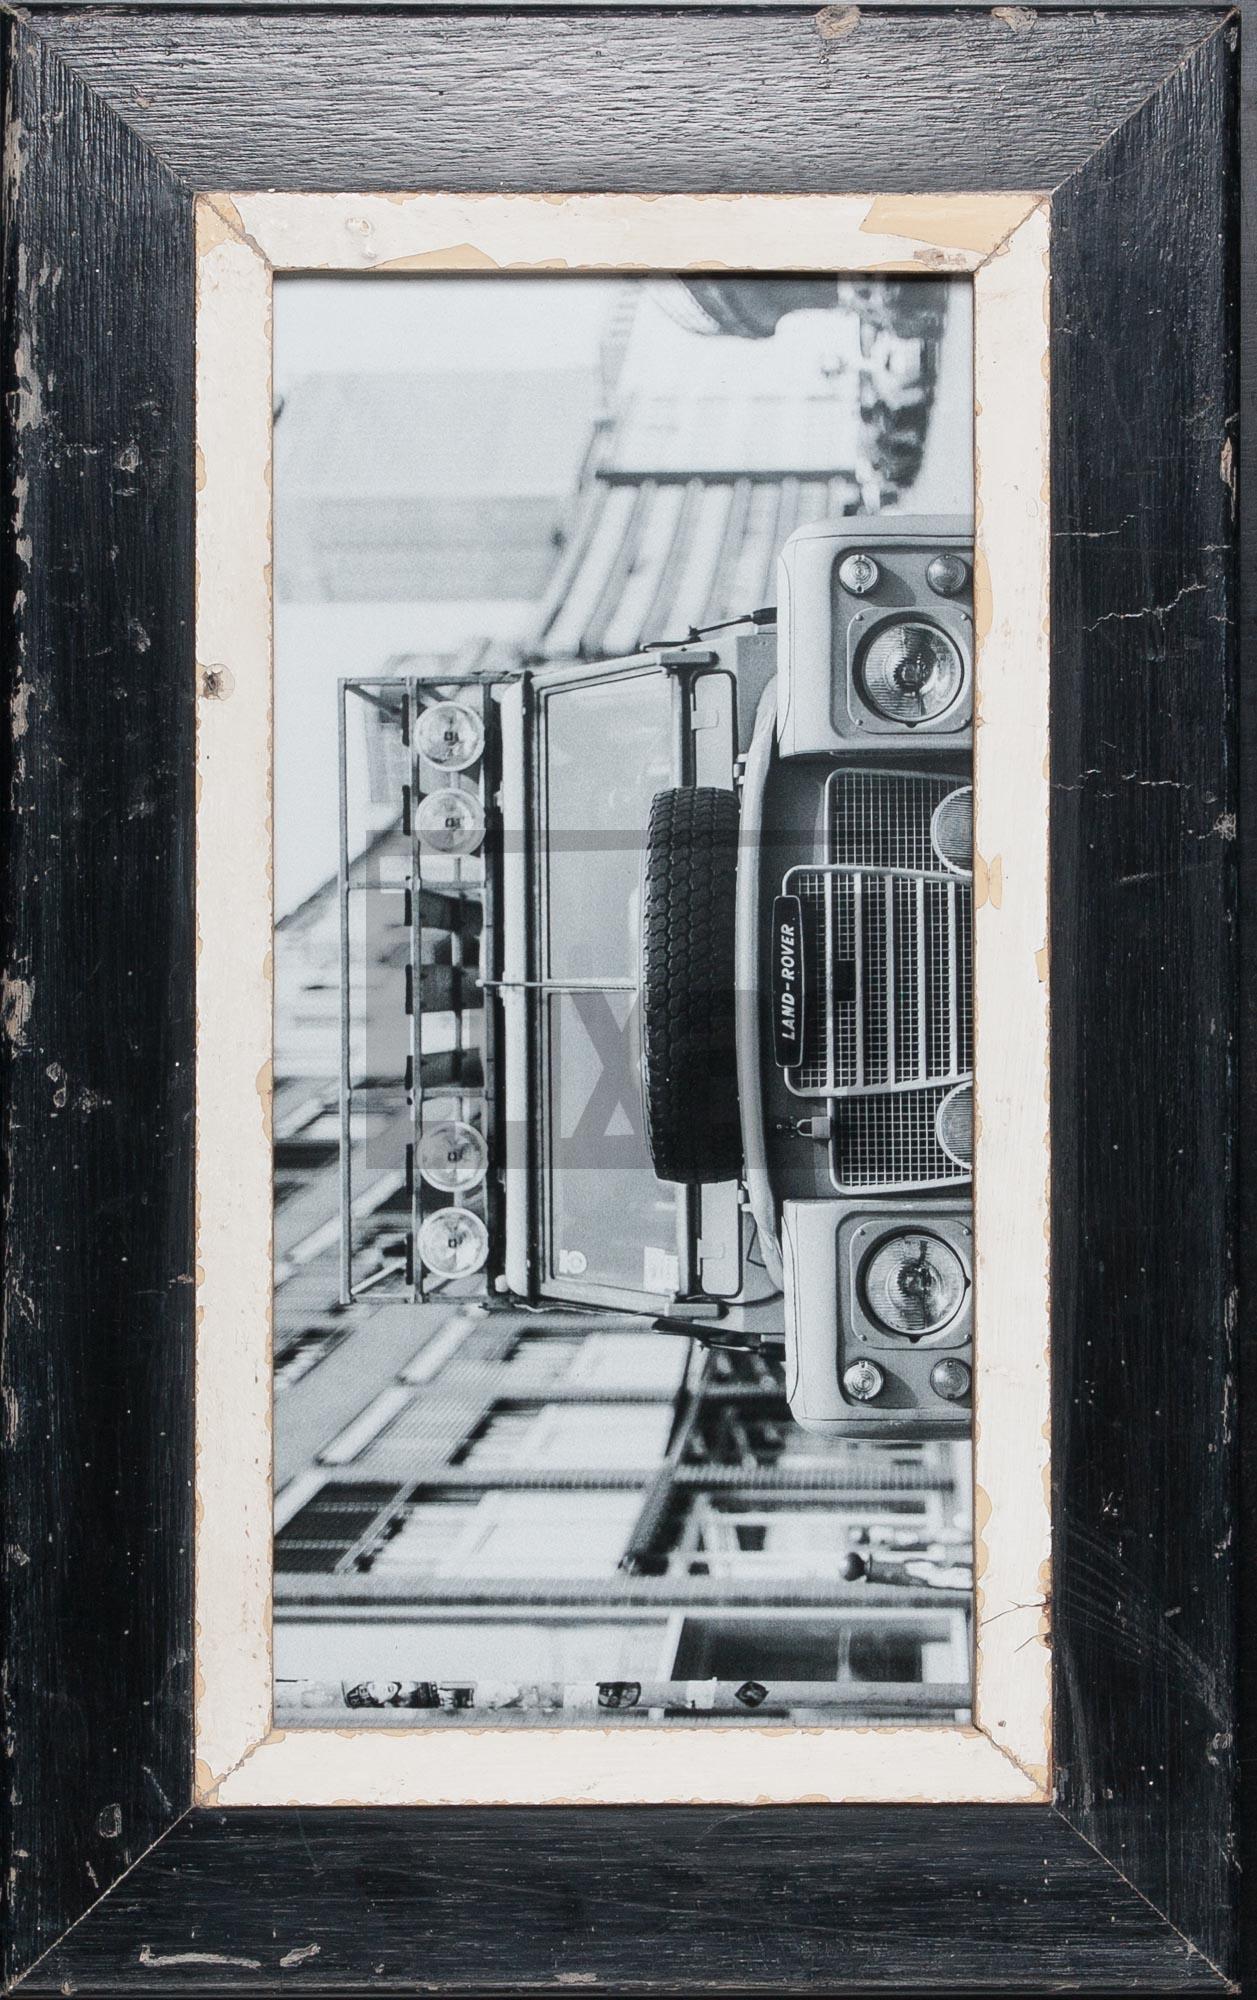 Panorama-Vintage-Bilderrahmen für Panoramafotos